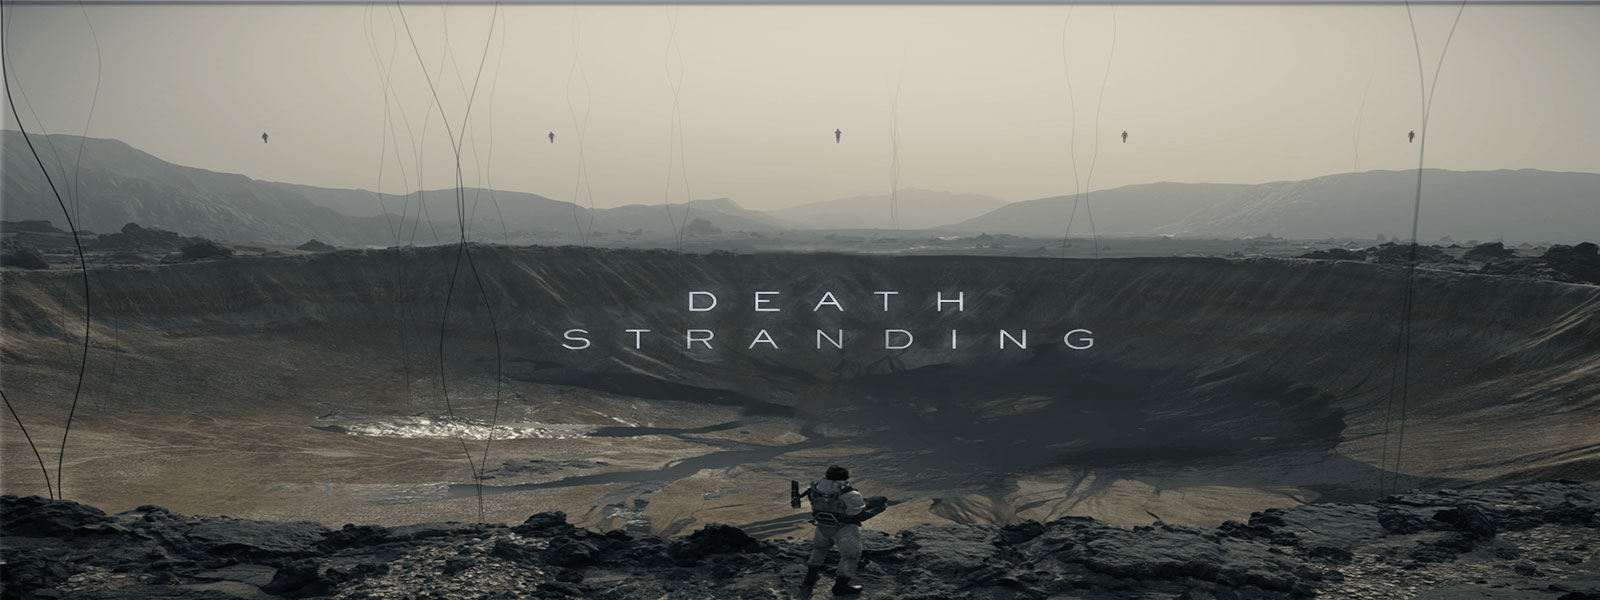 death stranding itecnoshop